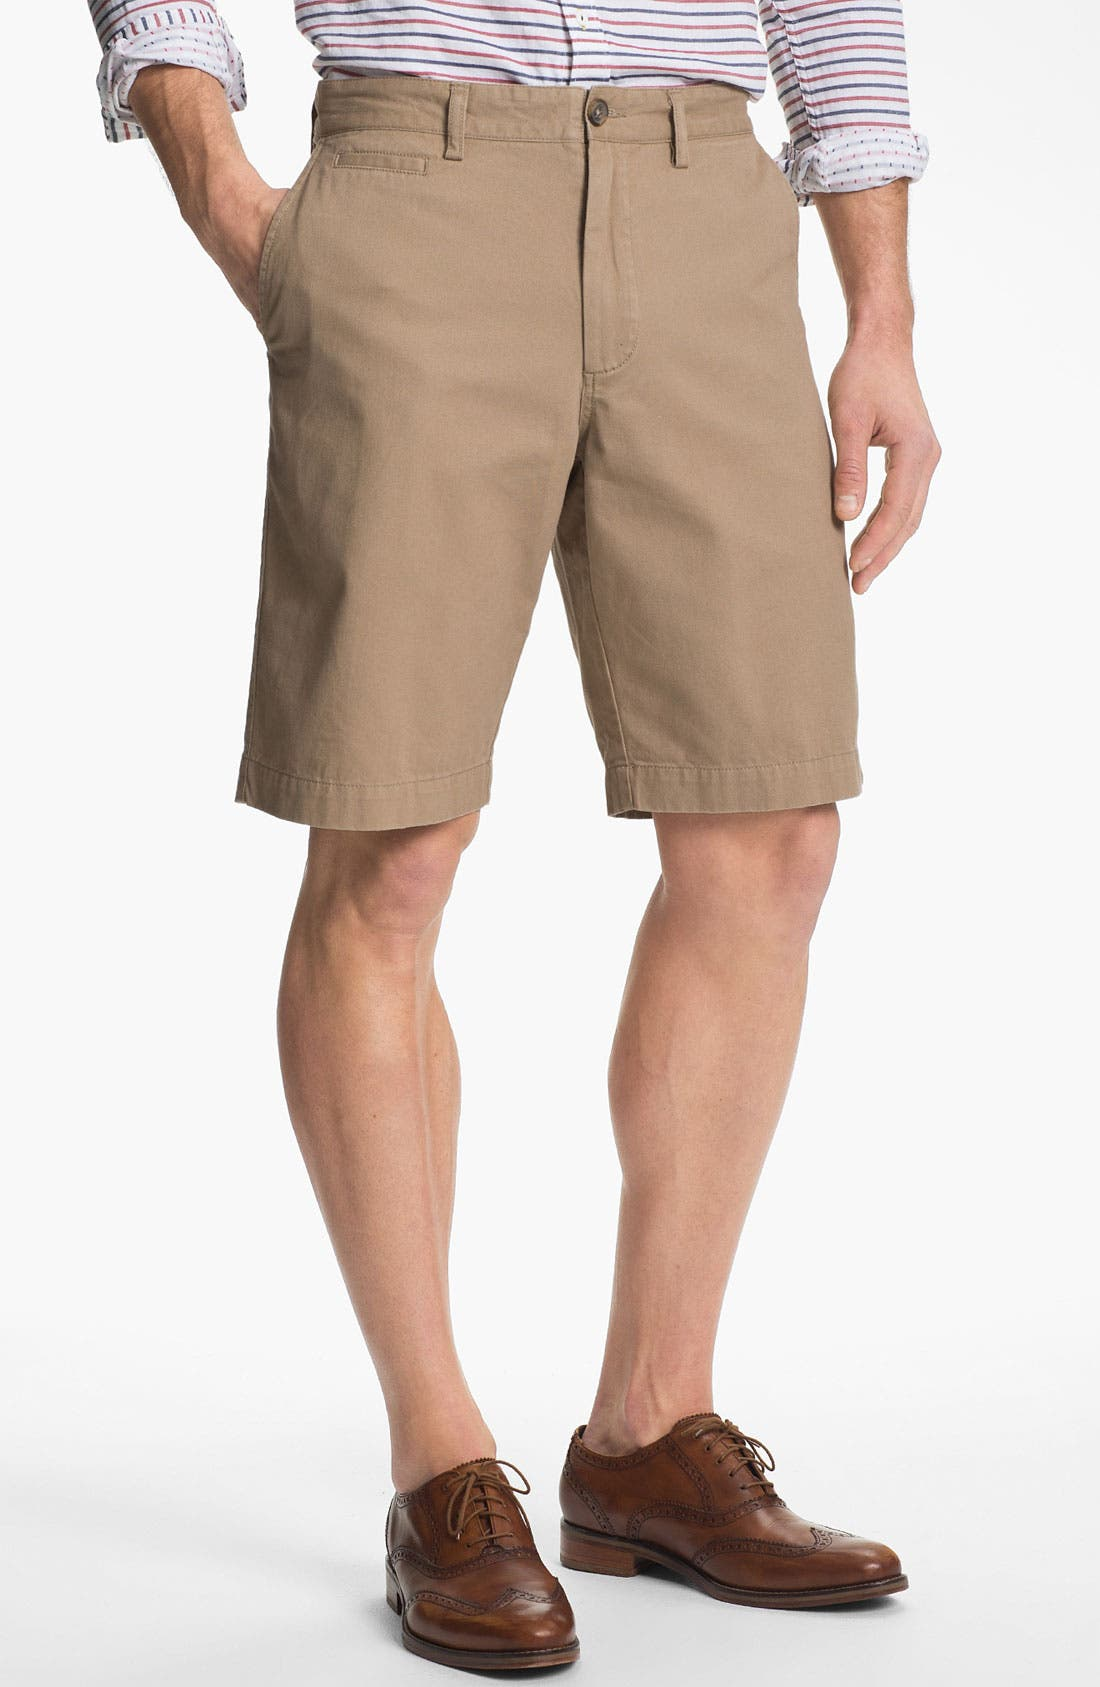 Alternate Image 1 Selected - Wallin & Bros. Flat Front Shorts